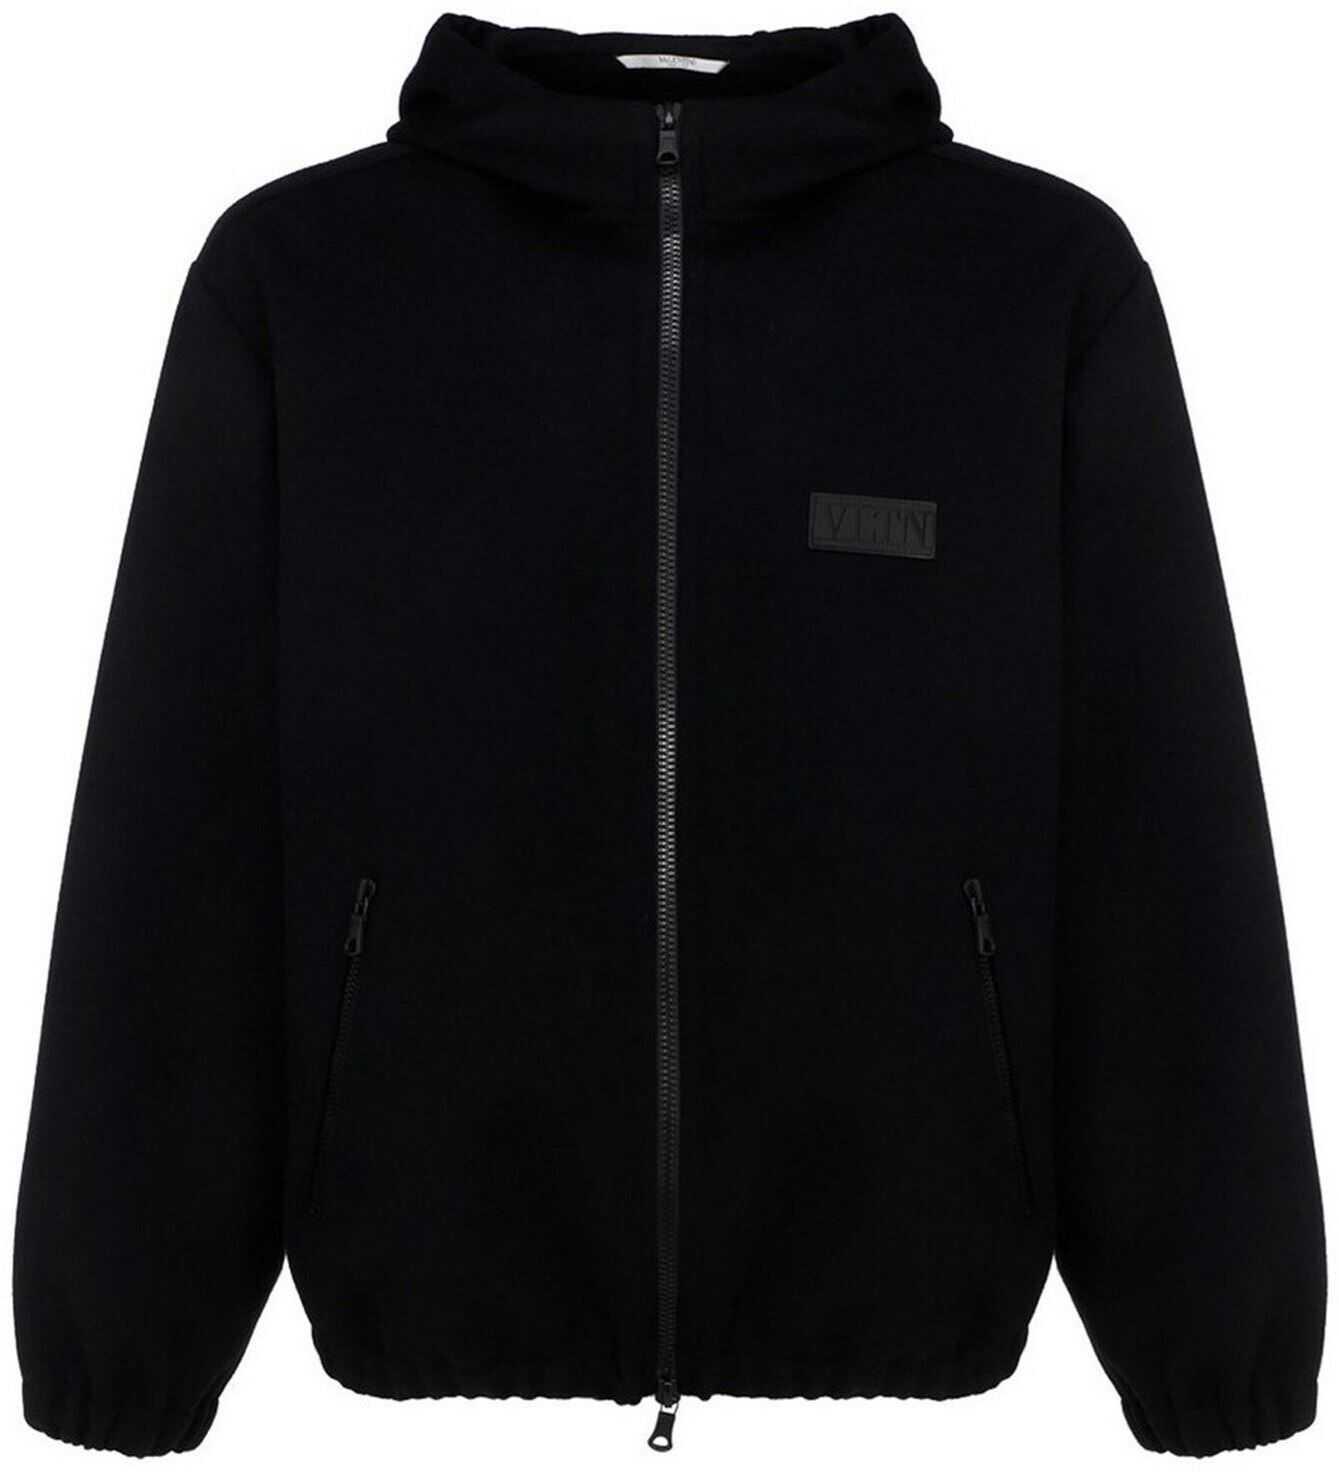 Valentino Garavani Cashmere-Wool Blend Jacket In Black Black imagine